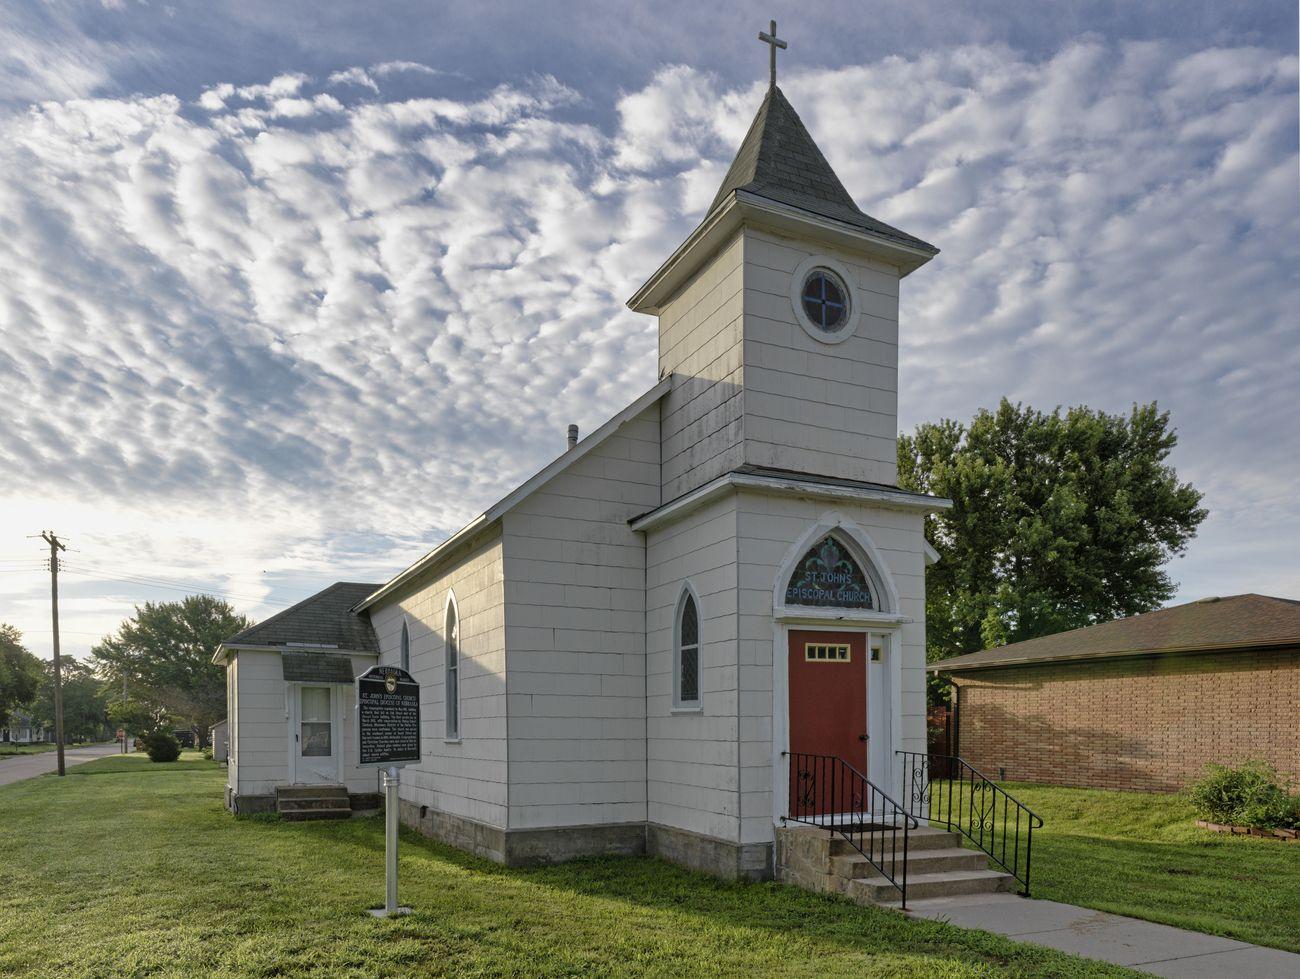 St. John's Episcopal Church Harvard, NE USA The first service was in 1882.